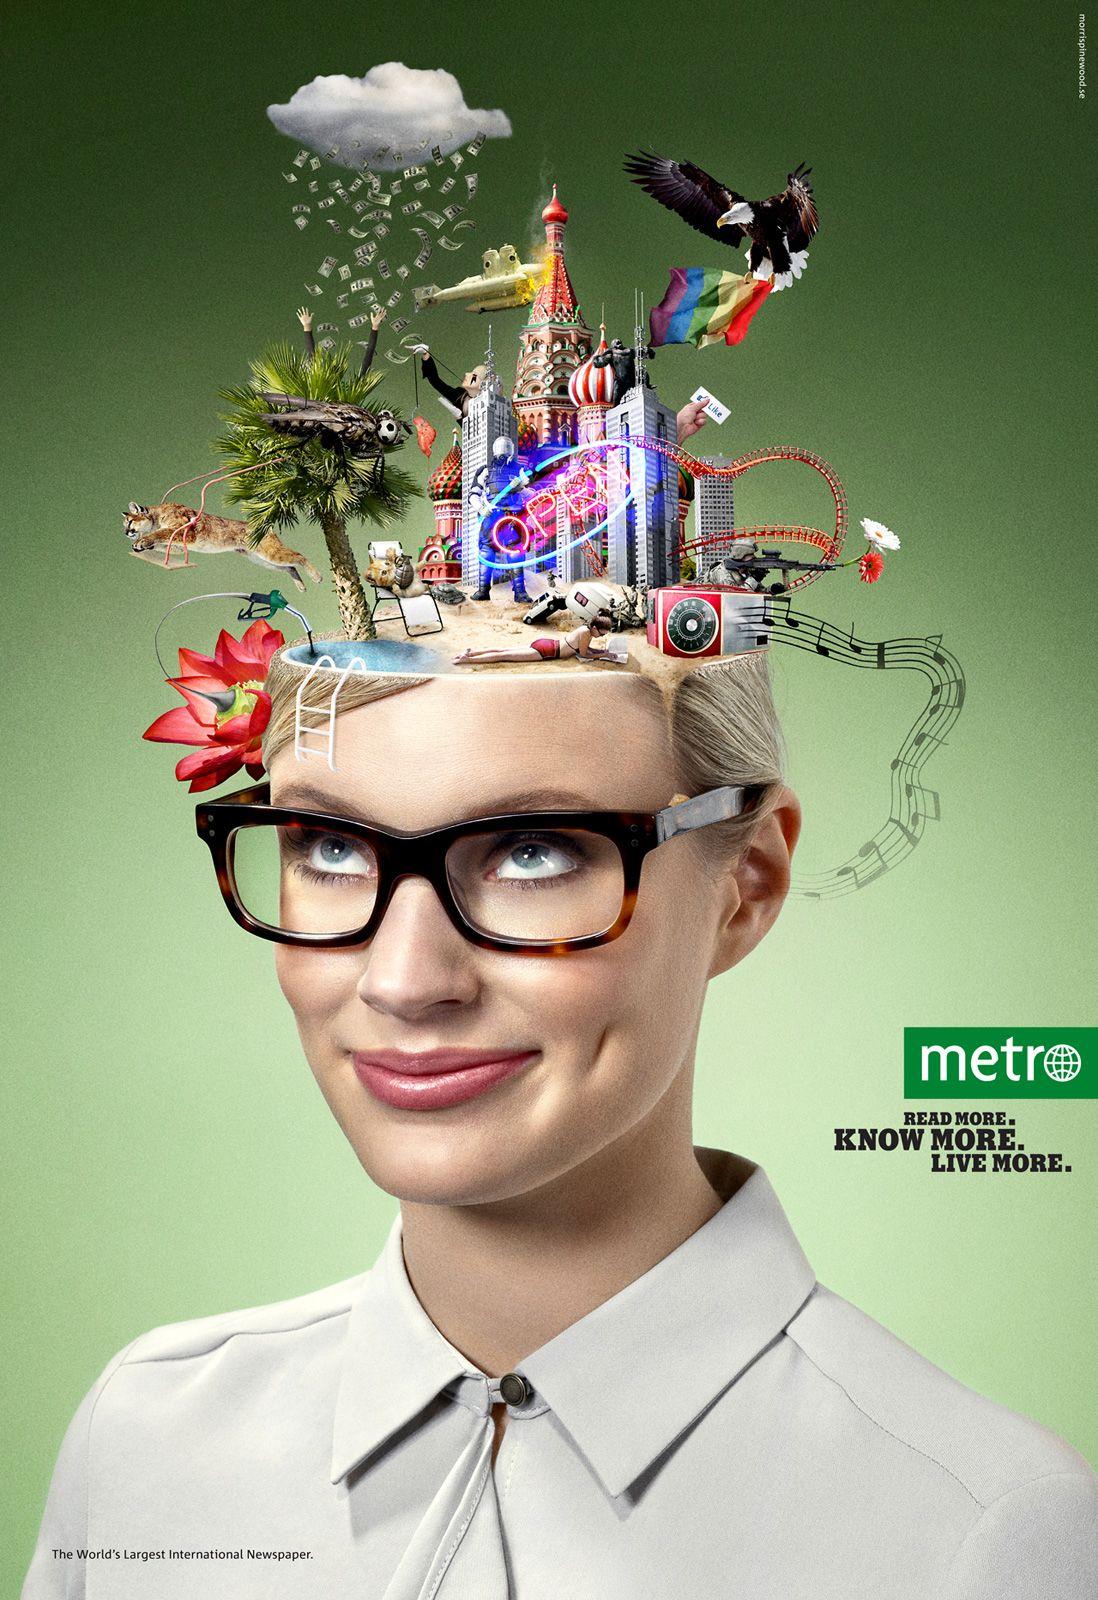 live more | creative ad awards | graphic design. | pinterest